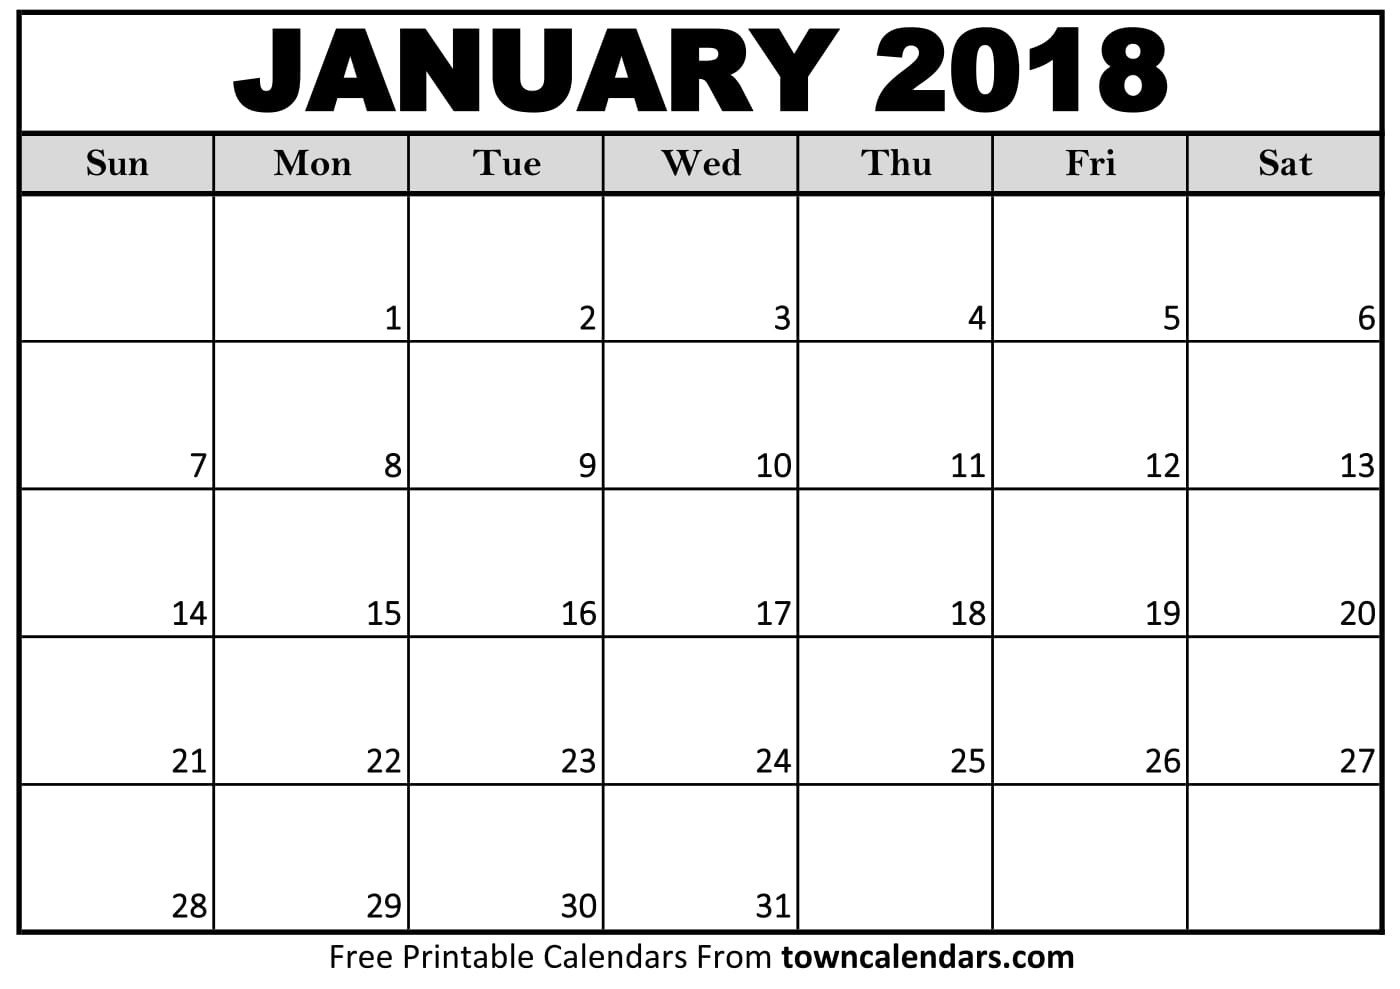 Blank Printable Calendar Template 2018 Calendar Printable towncalendars